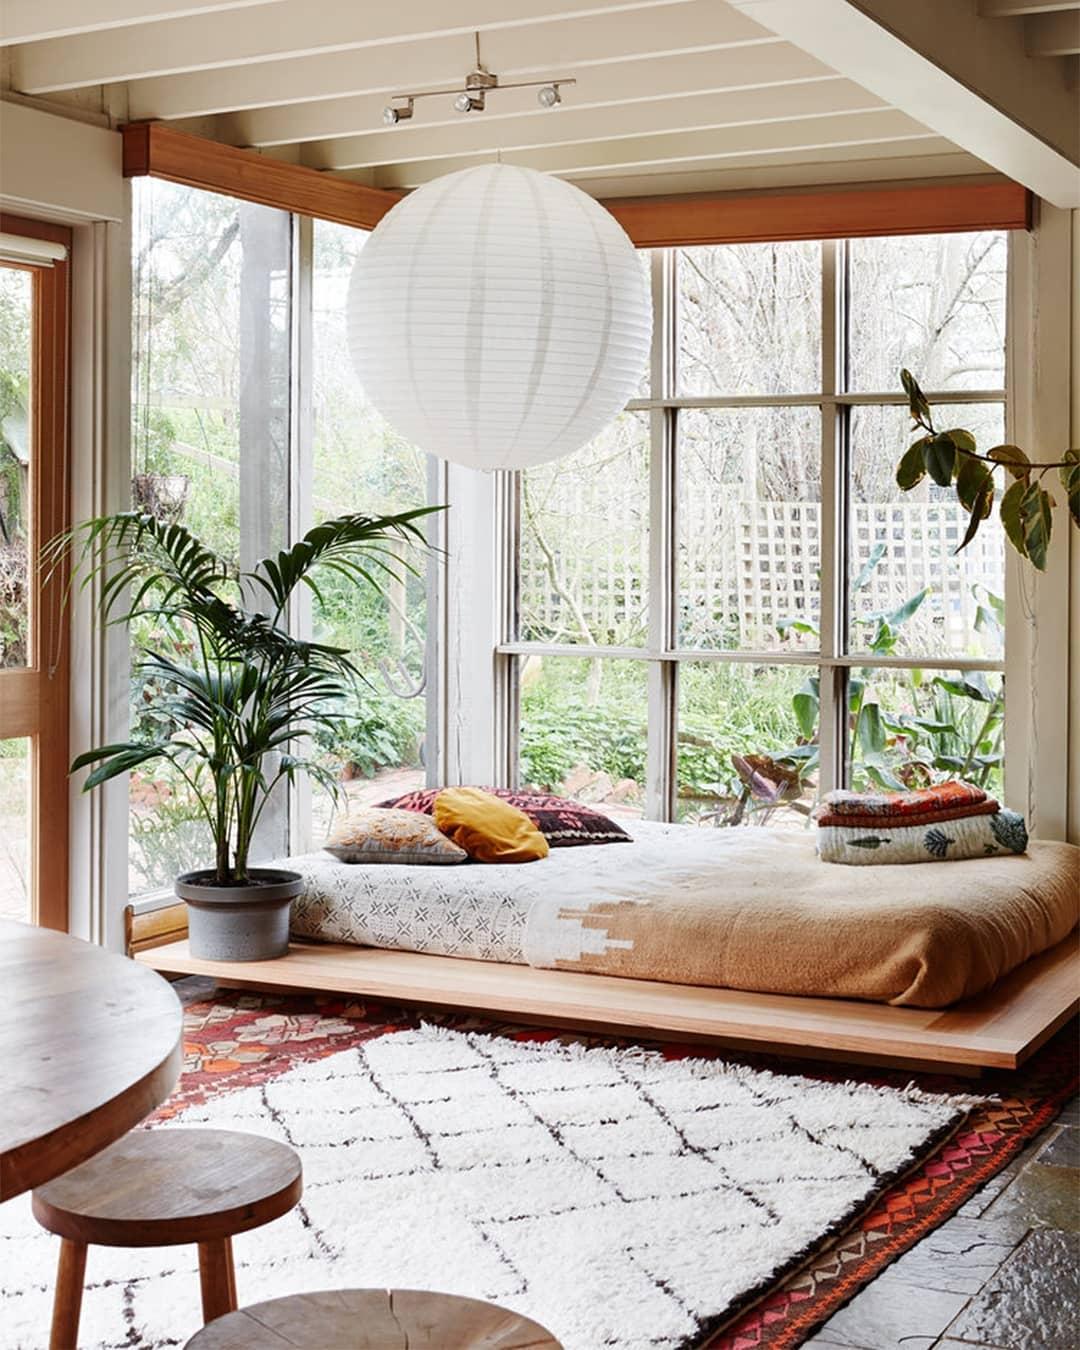 mas-de-30-impresionantes-esquemas-de-diseno-de-dormitorios-pequenos-que-te-encantara-nuevo-2020